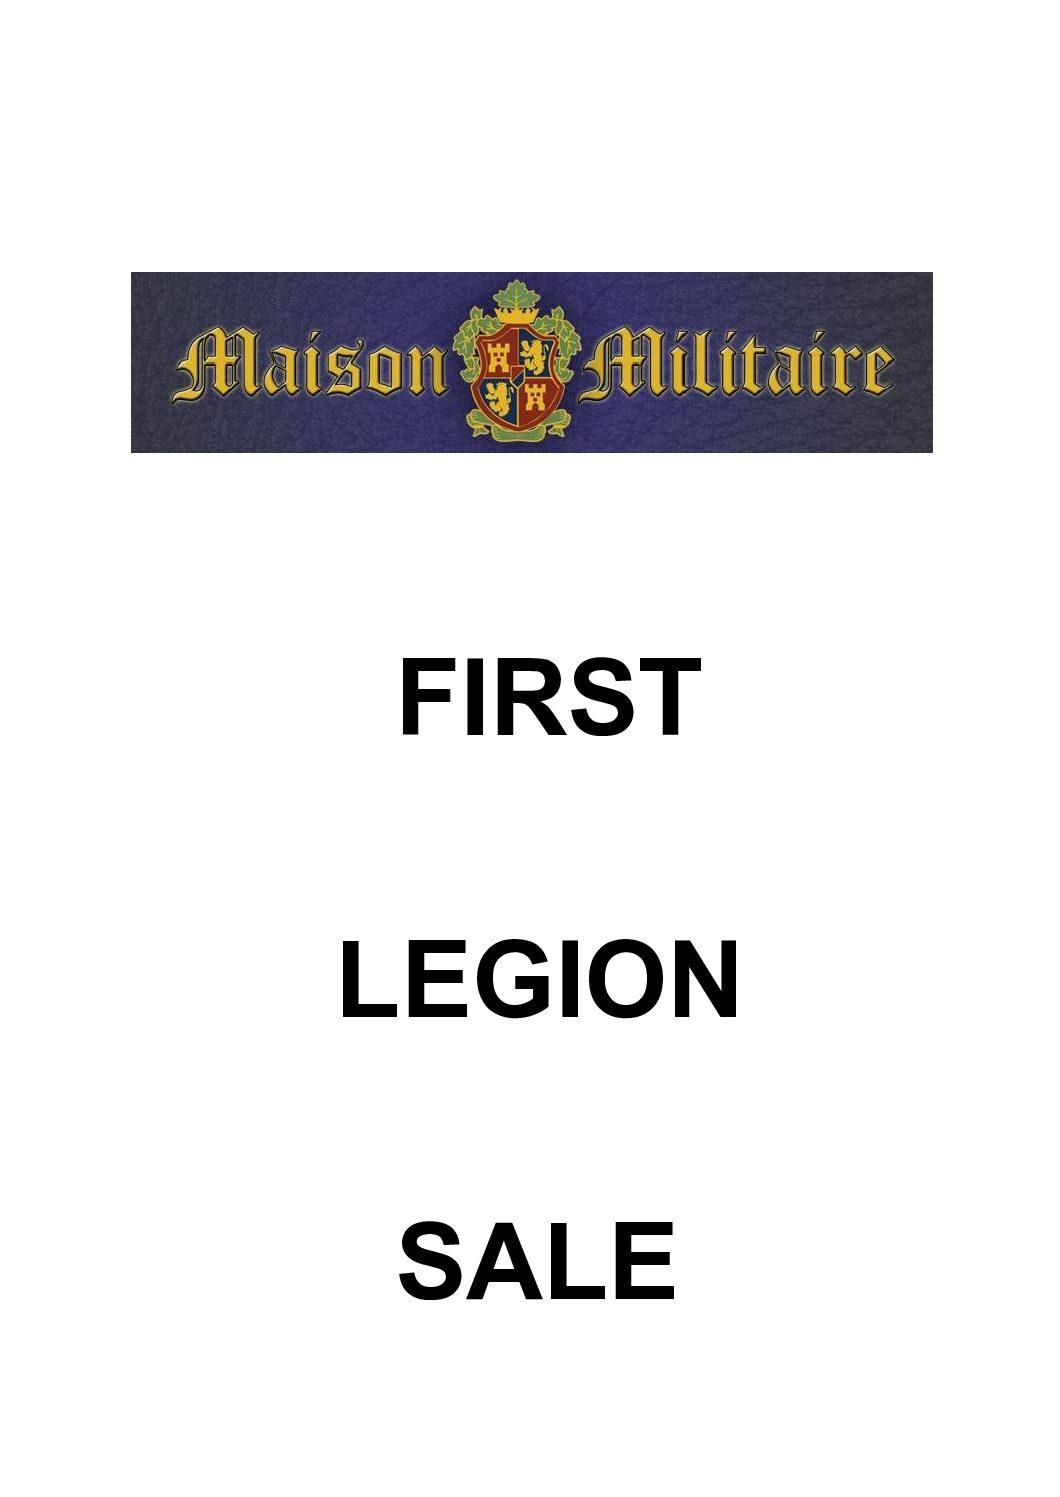 First Legion Sale.